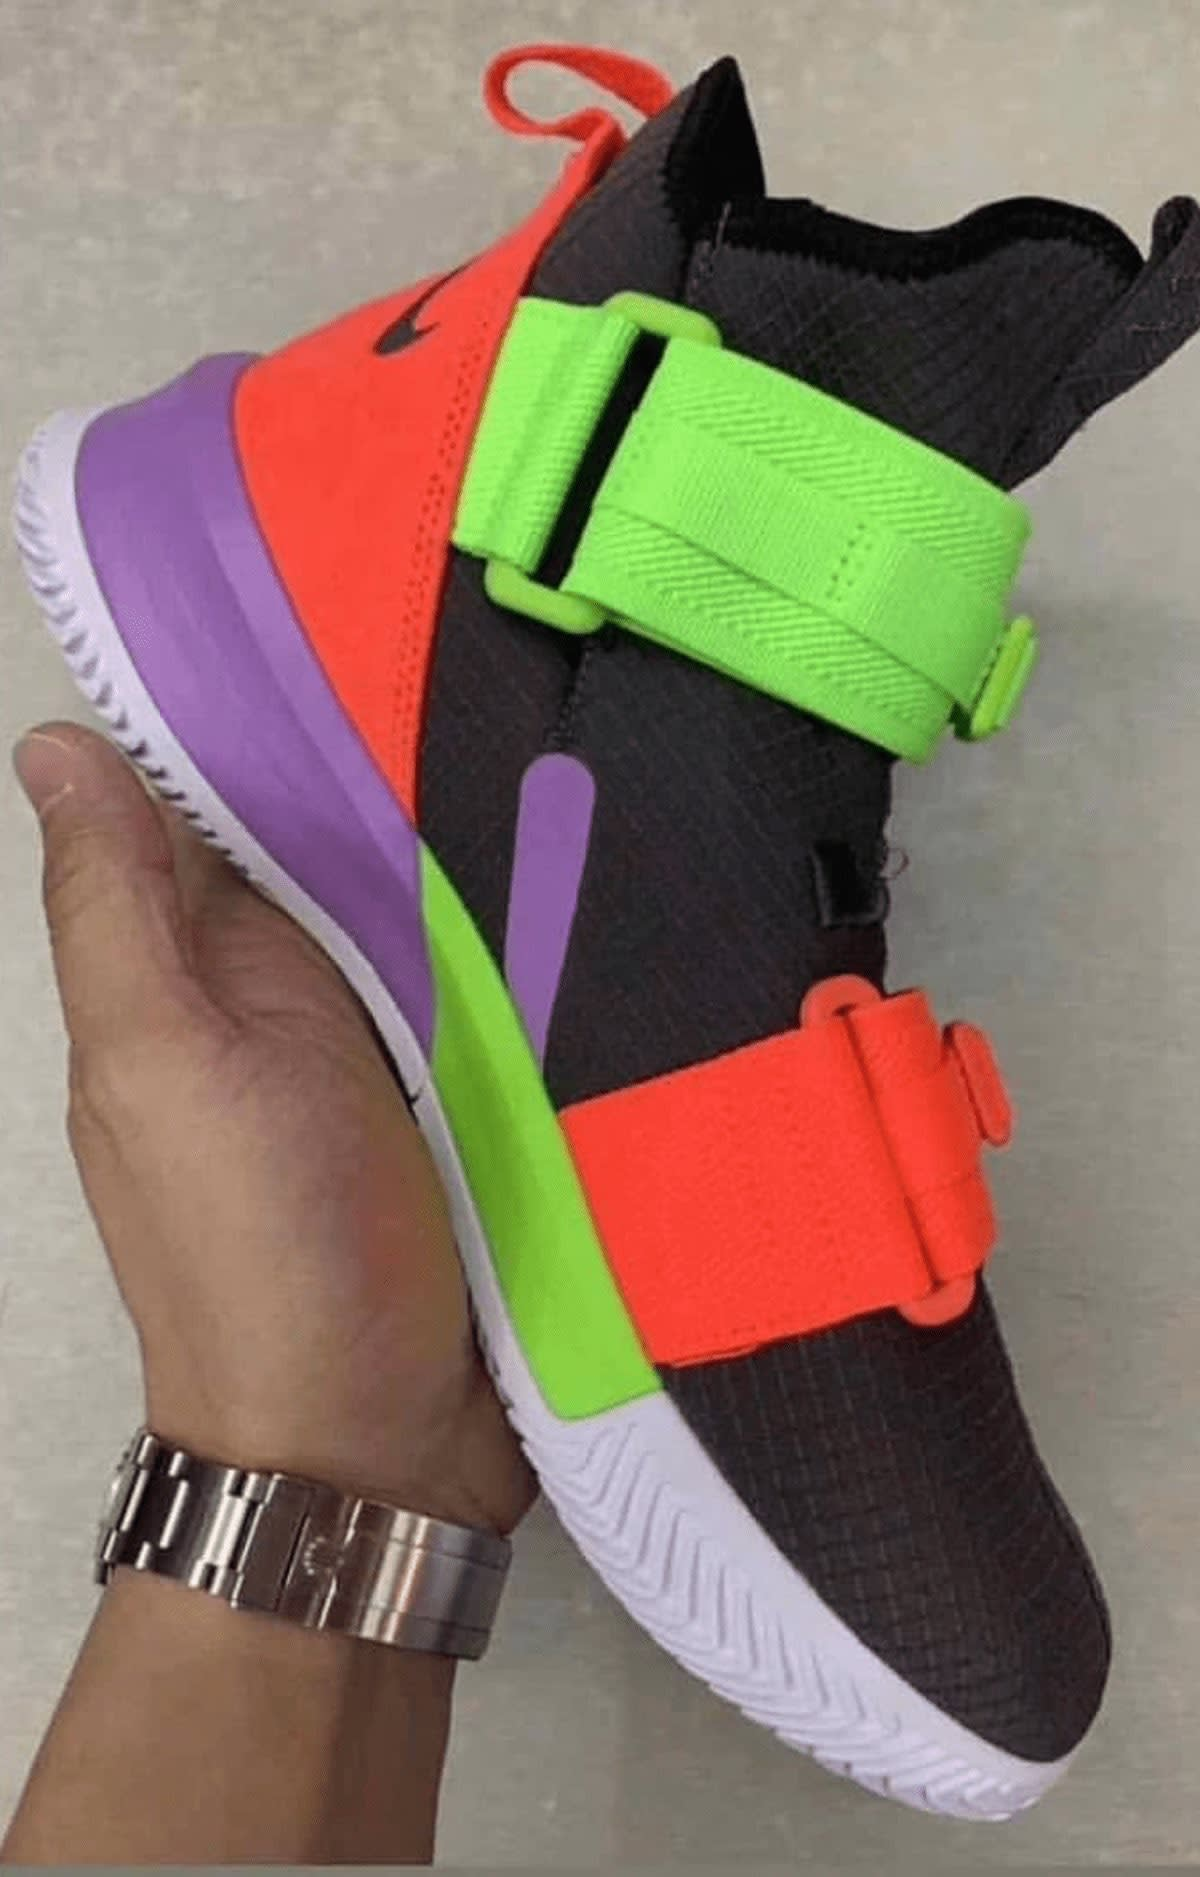 Nike LeBron Soldier 13 Medial